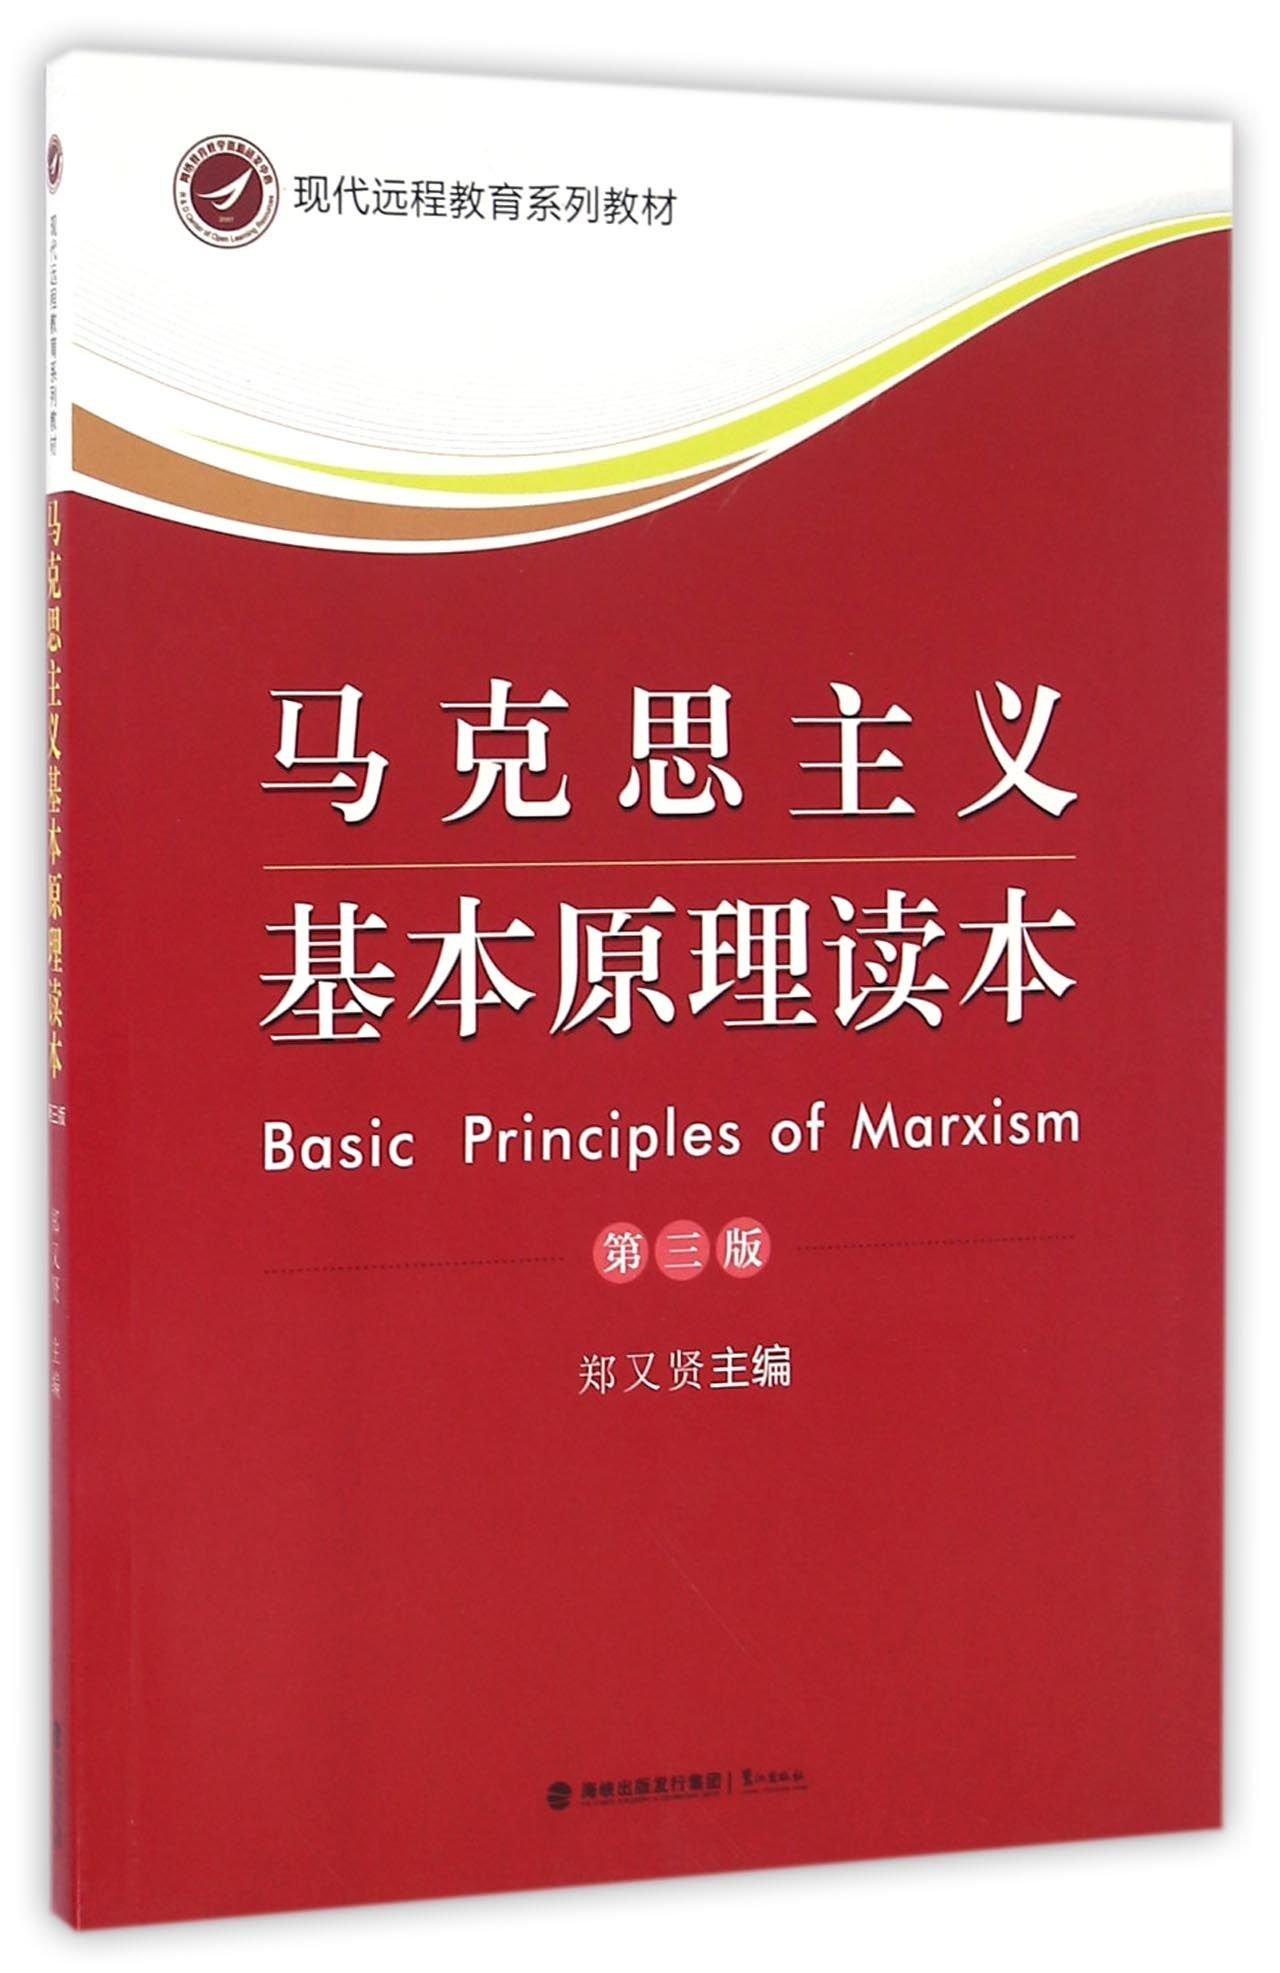 Download 马克思主义基本原理读本(第3版现代远程教育系列教材) ebook